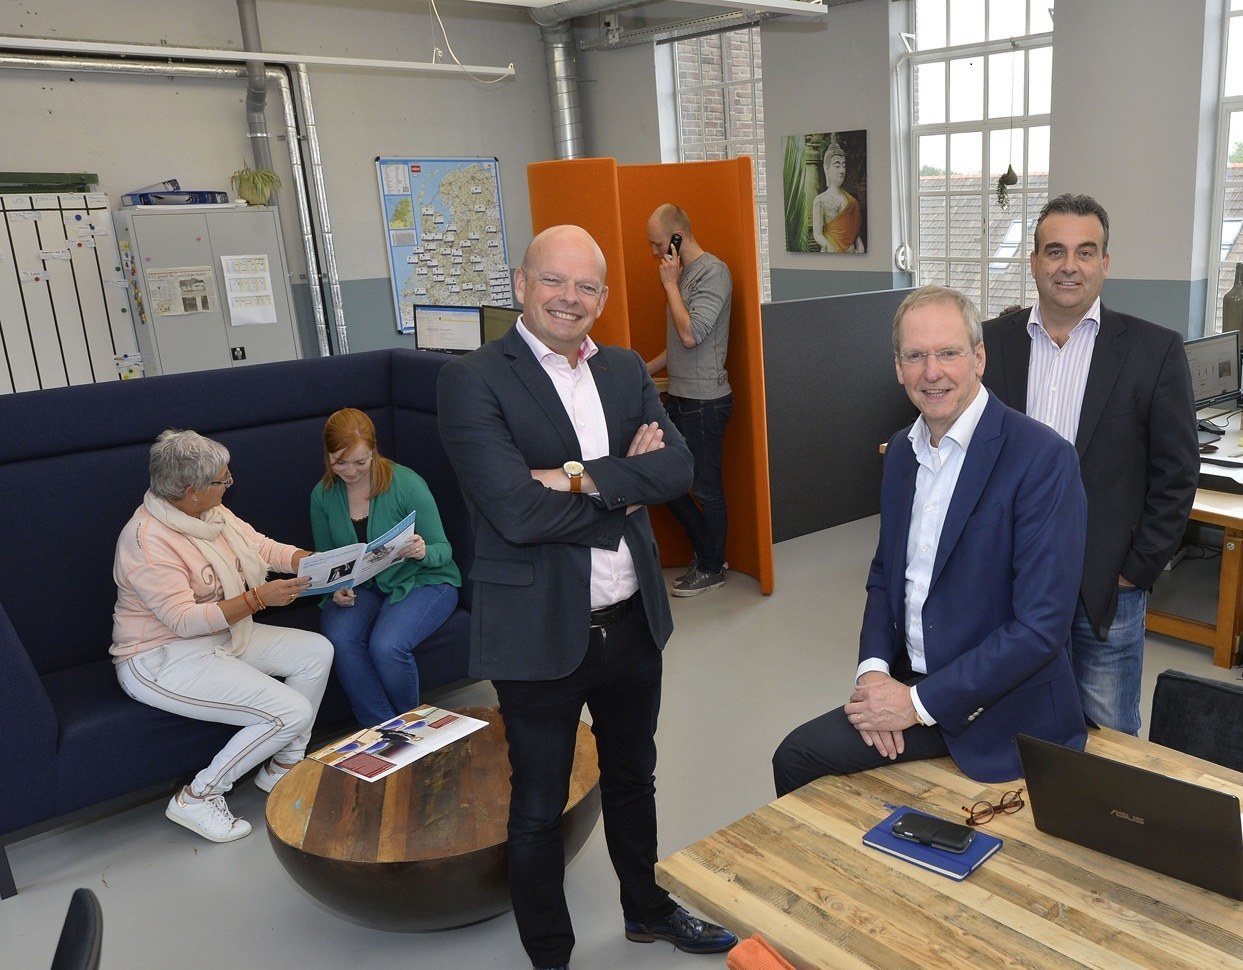 Oisterwijk Collin Crowdfund